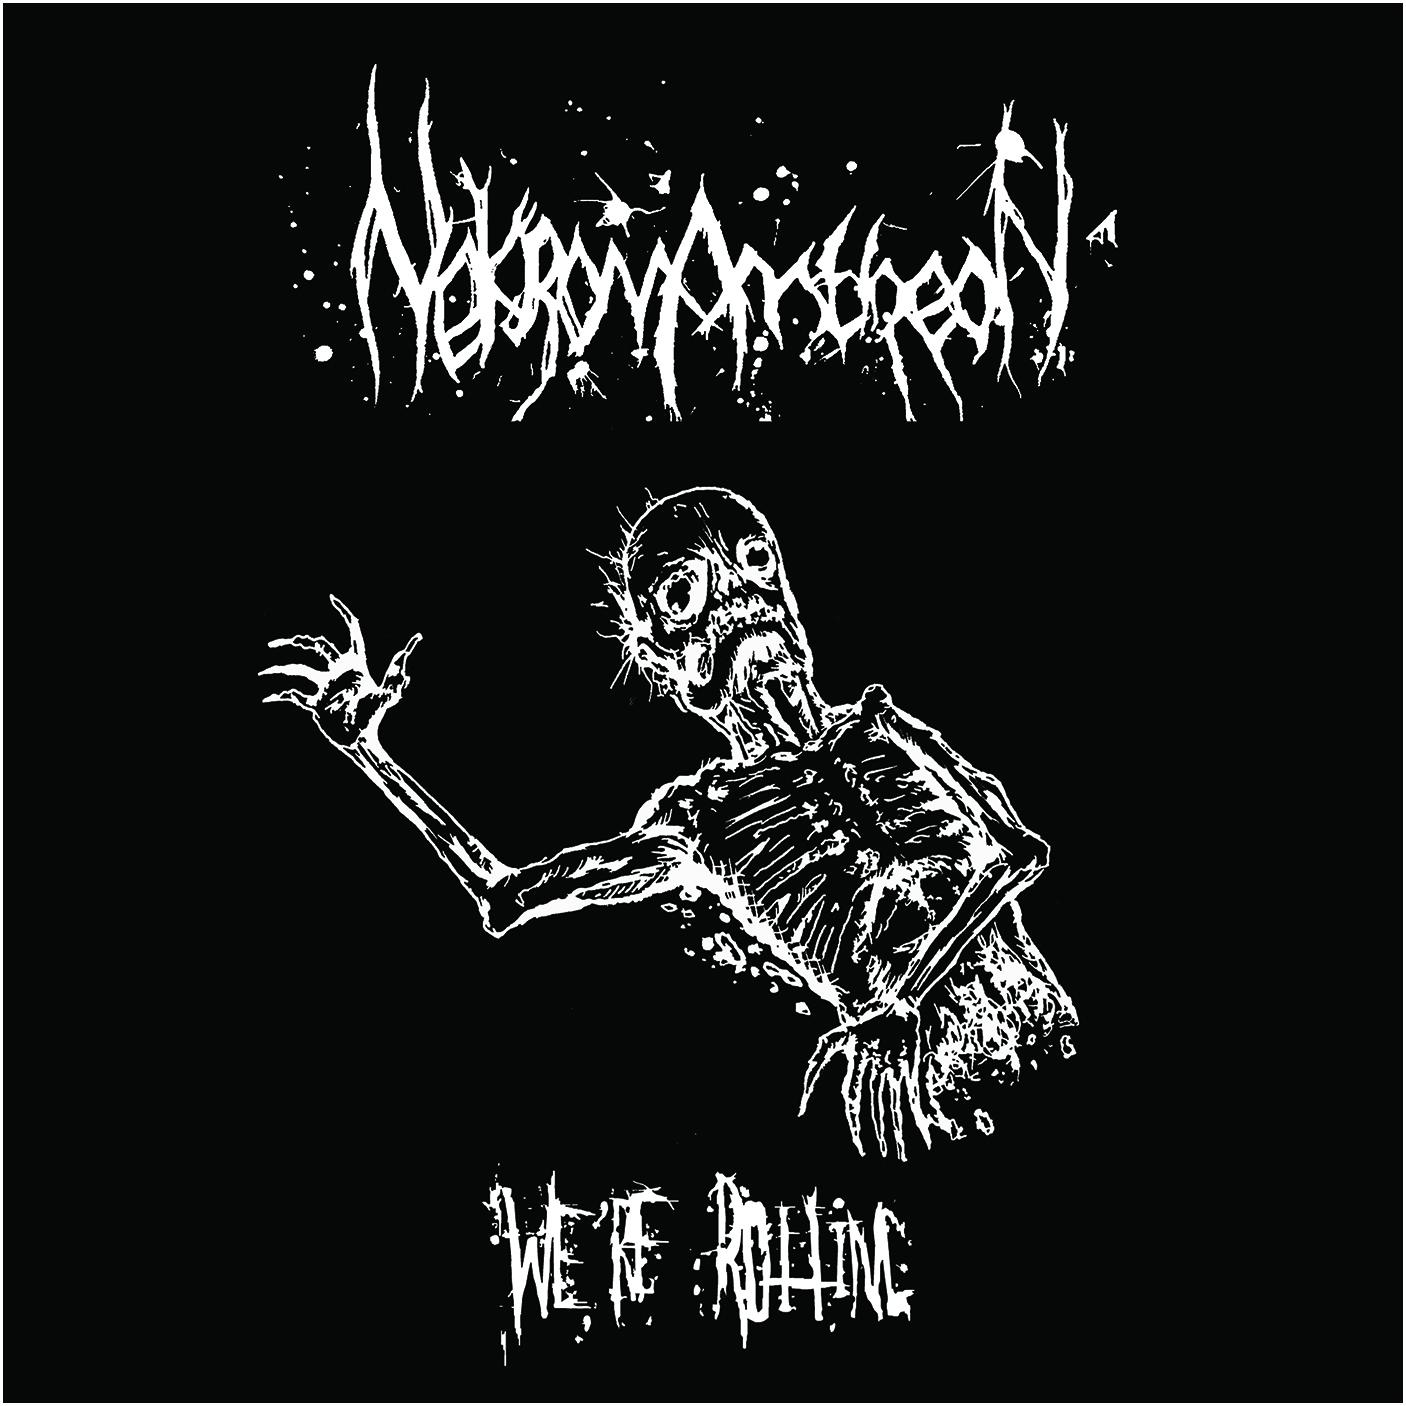 Nekromantheon - We're Rotting - 2007